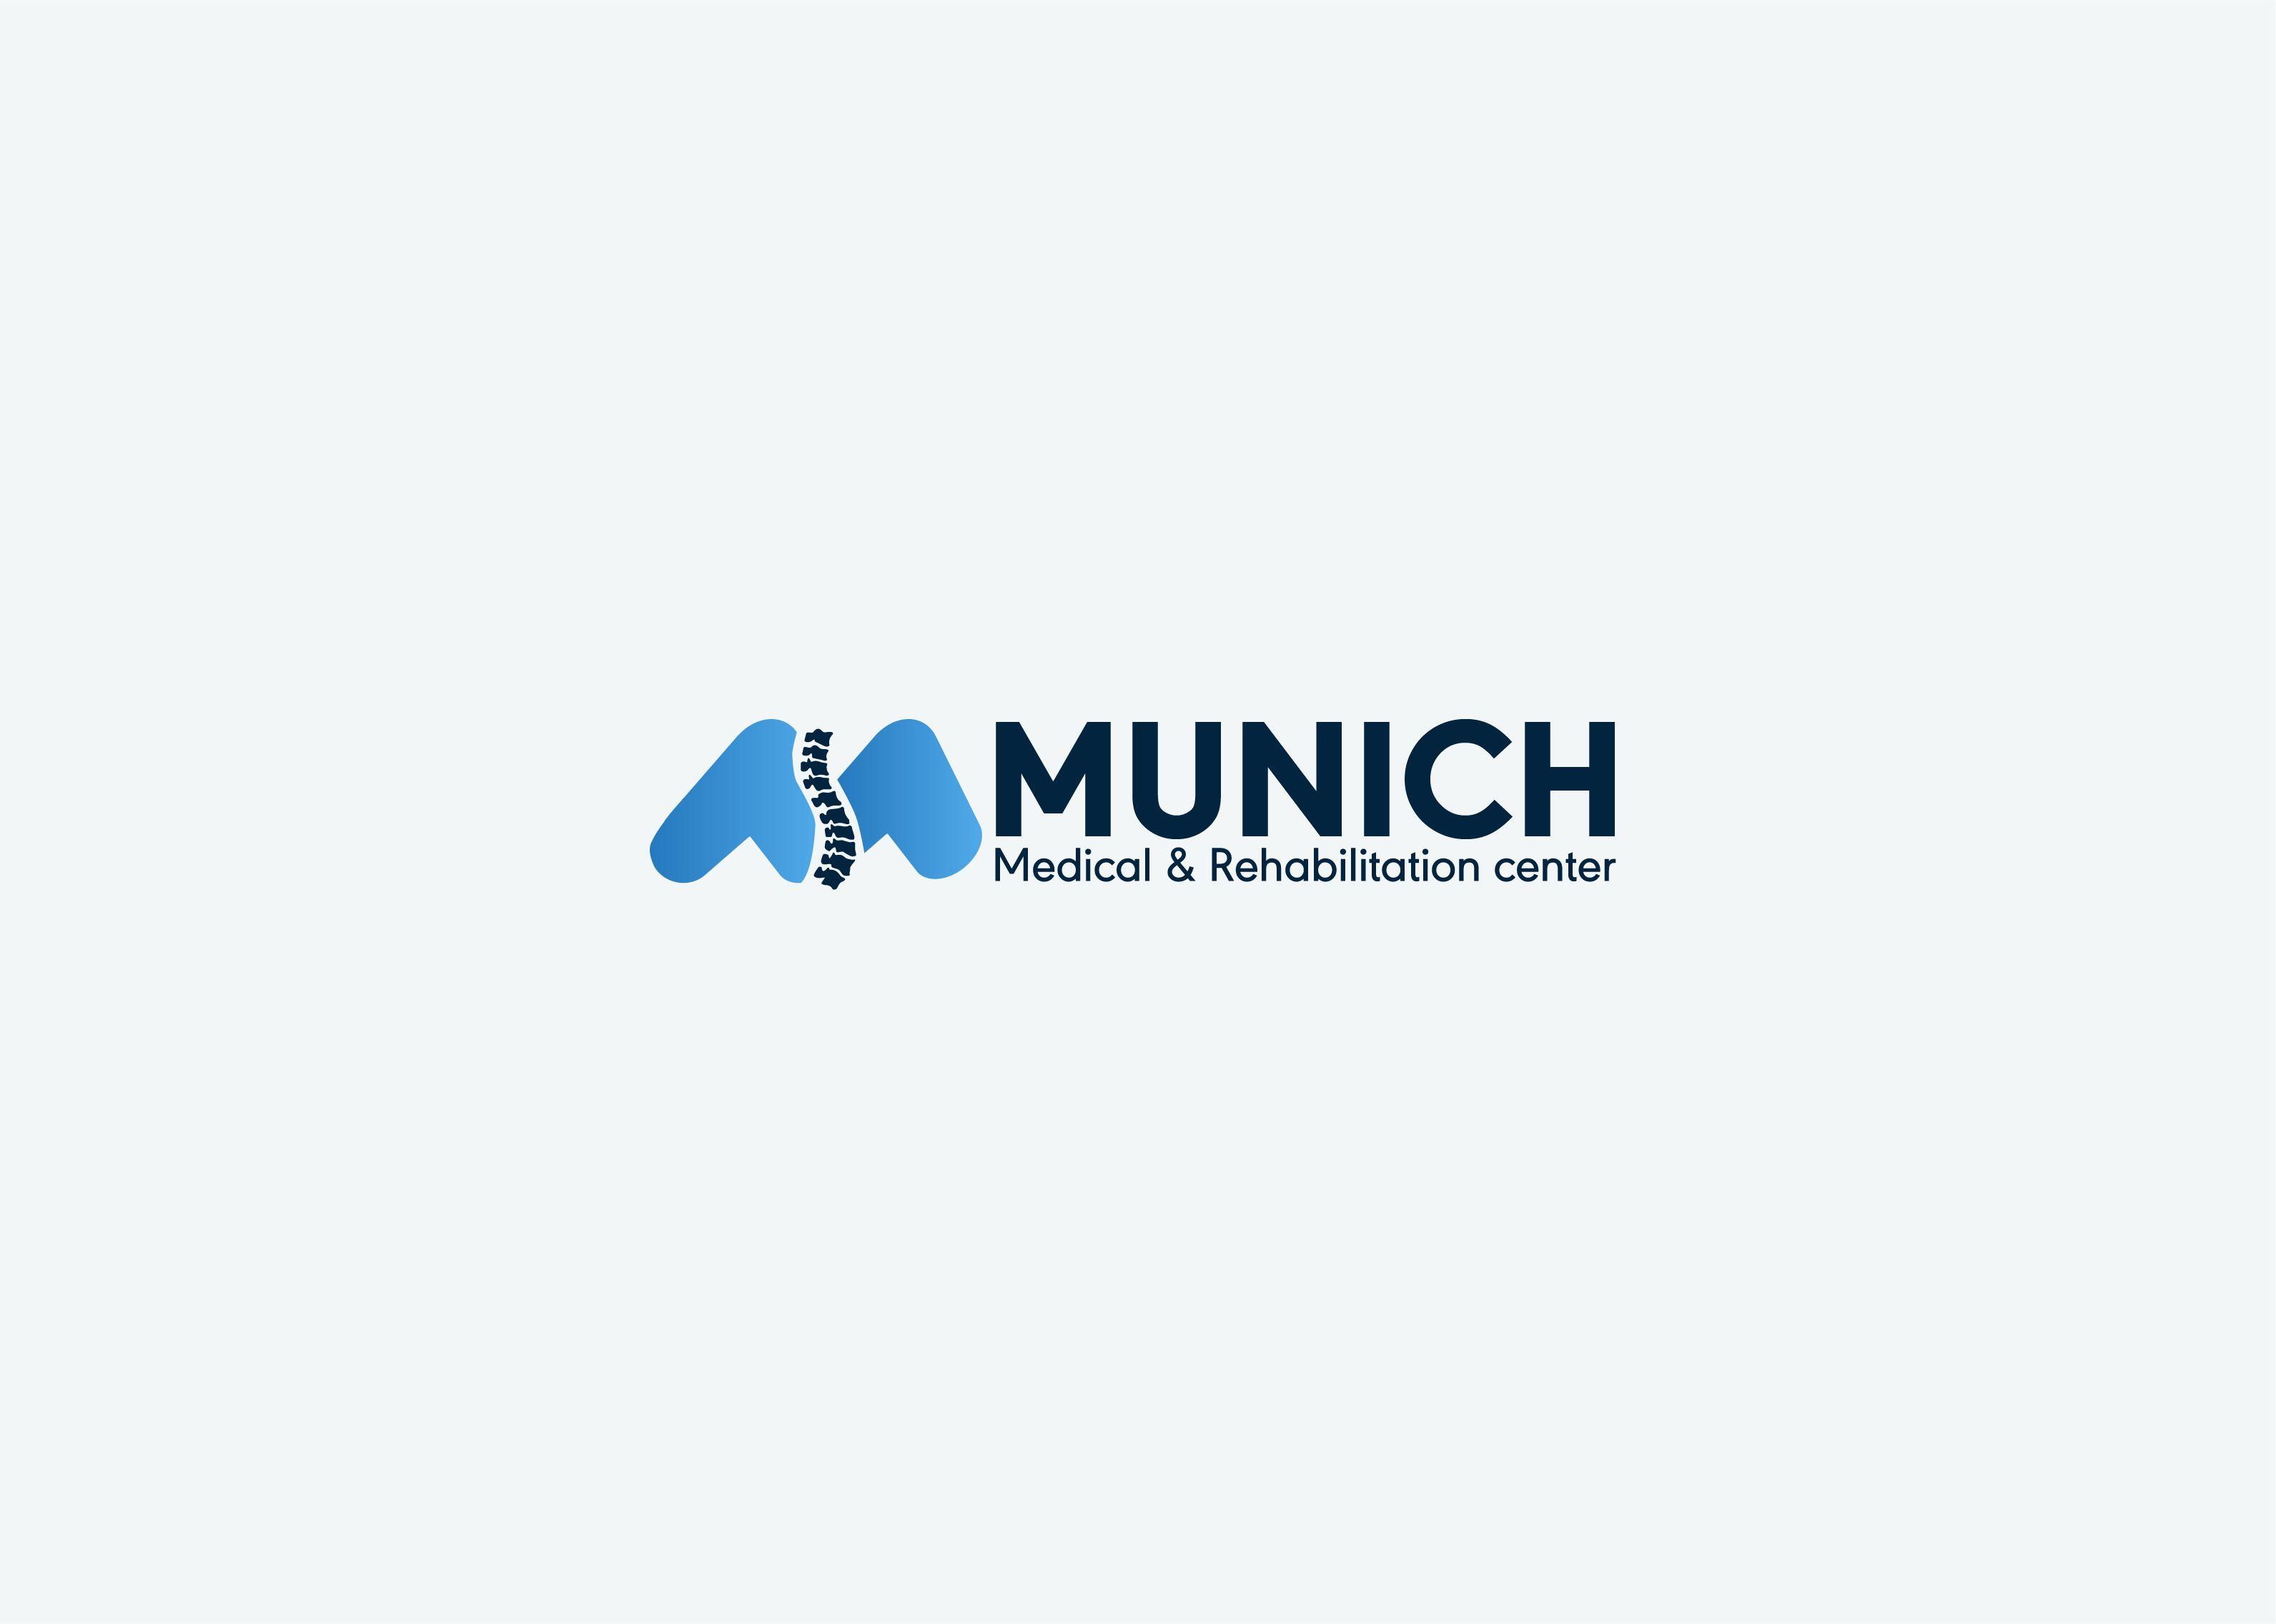 Munich Logo Design For Medical Rehabilitation Center Logo Design Logos Rehabilitation Center